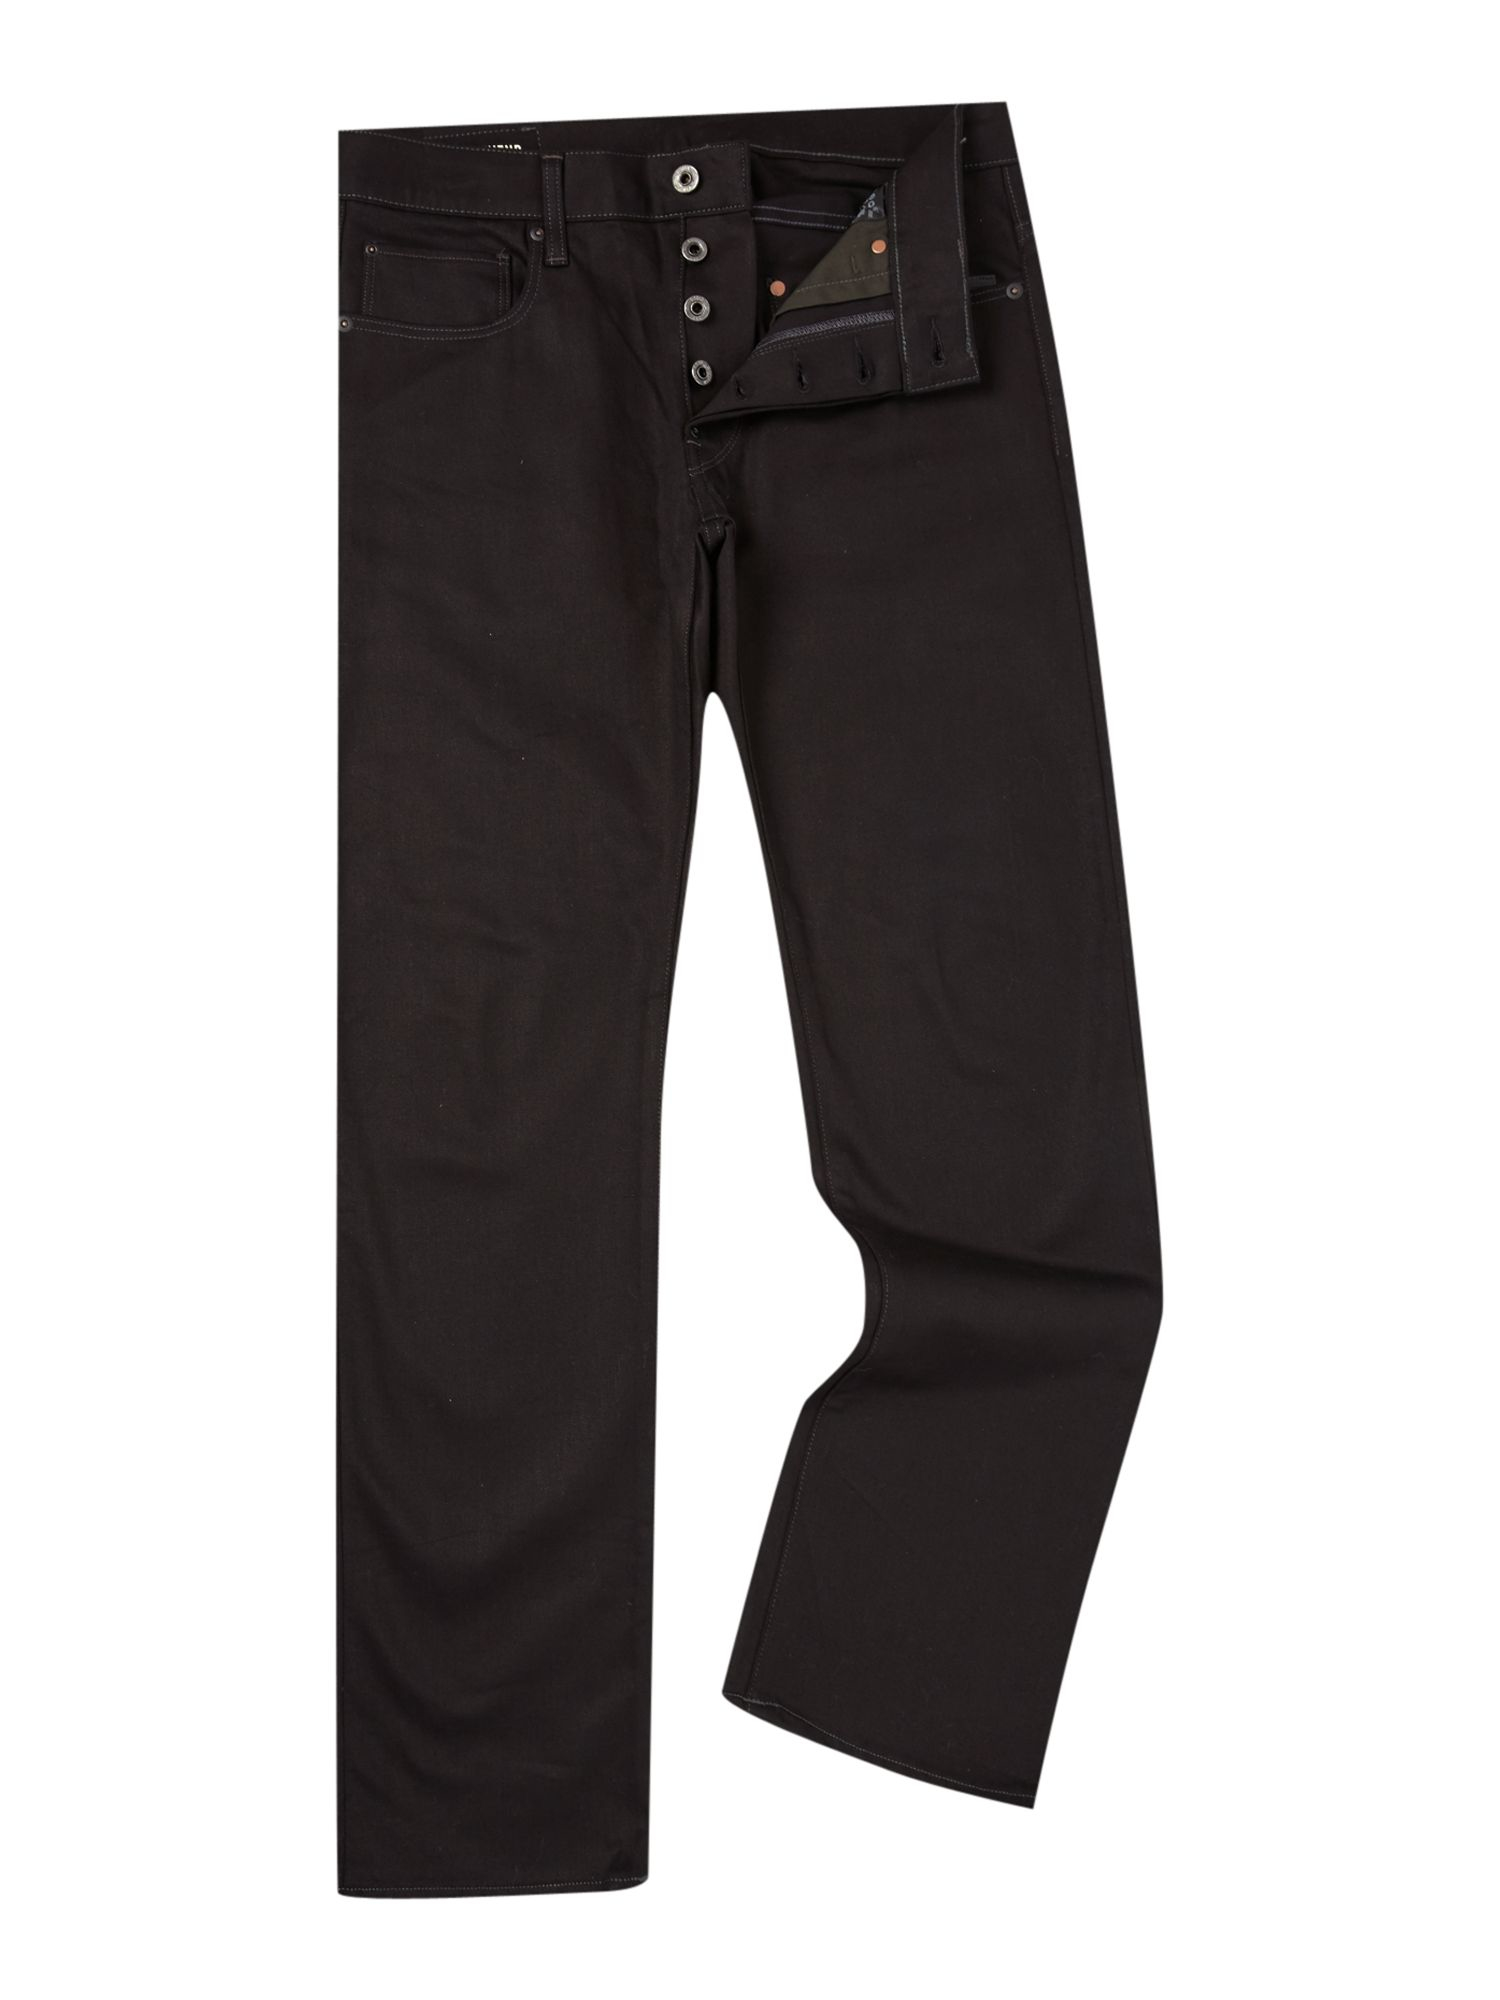 G-star raw Revend Raw Black Straight Leg Jean in Black for Men | Lyst